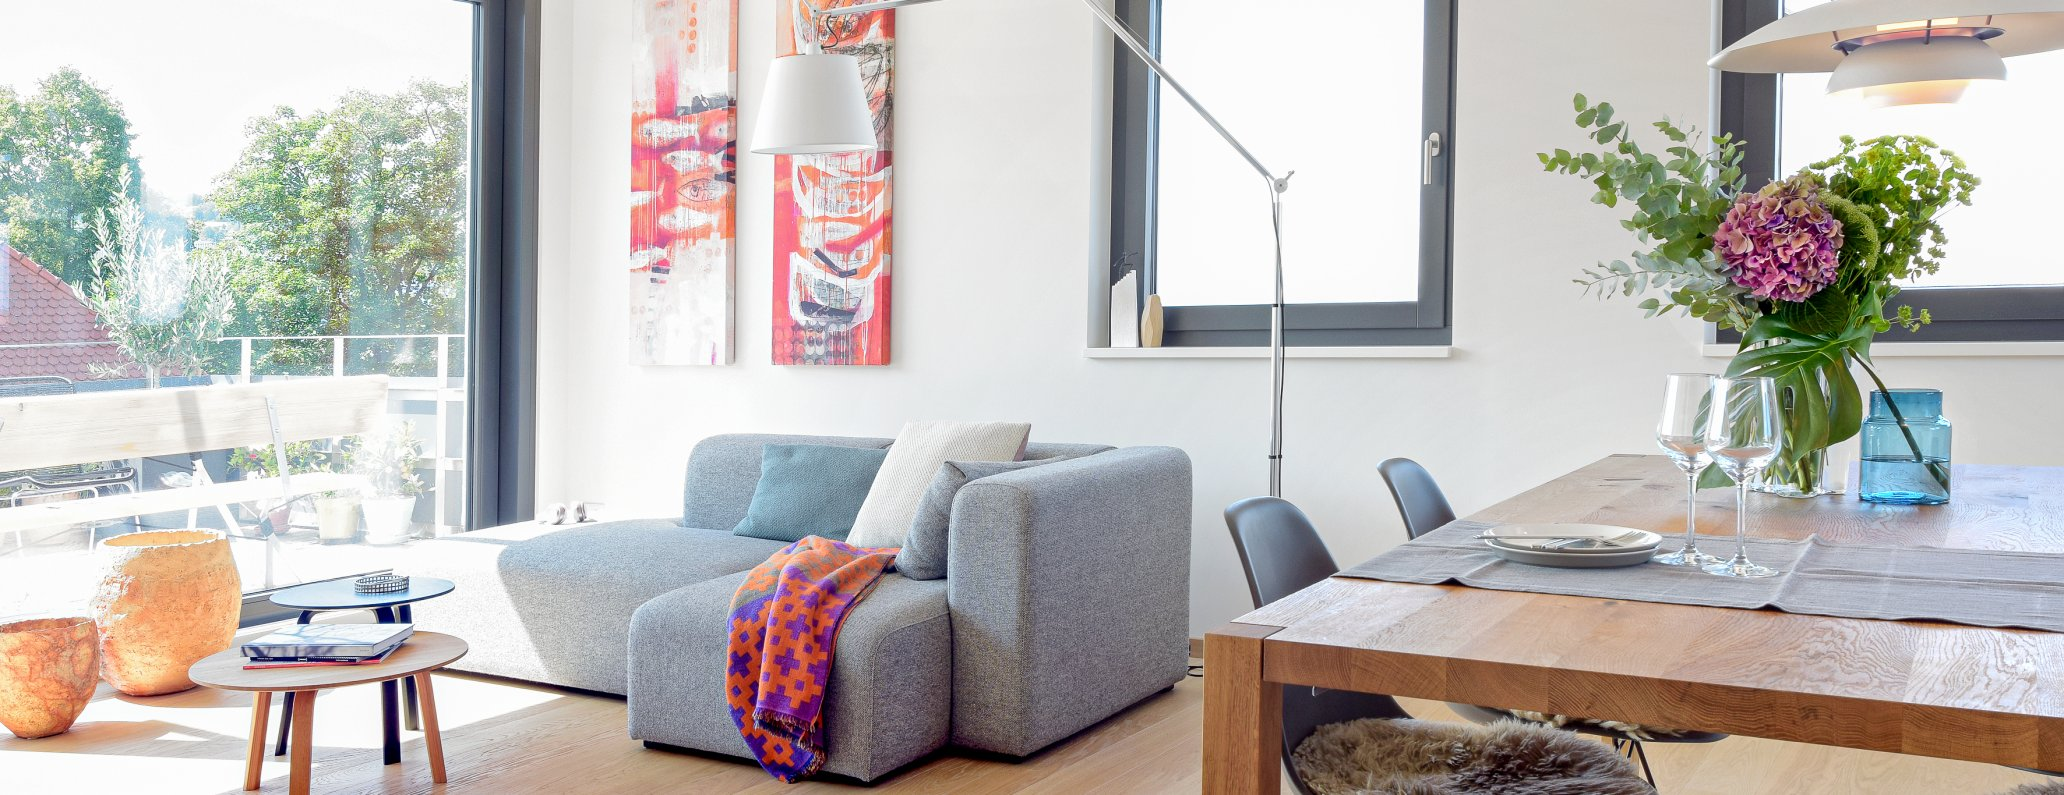 Living room and open kitchen, Stuttgart